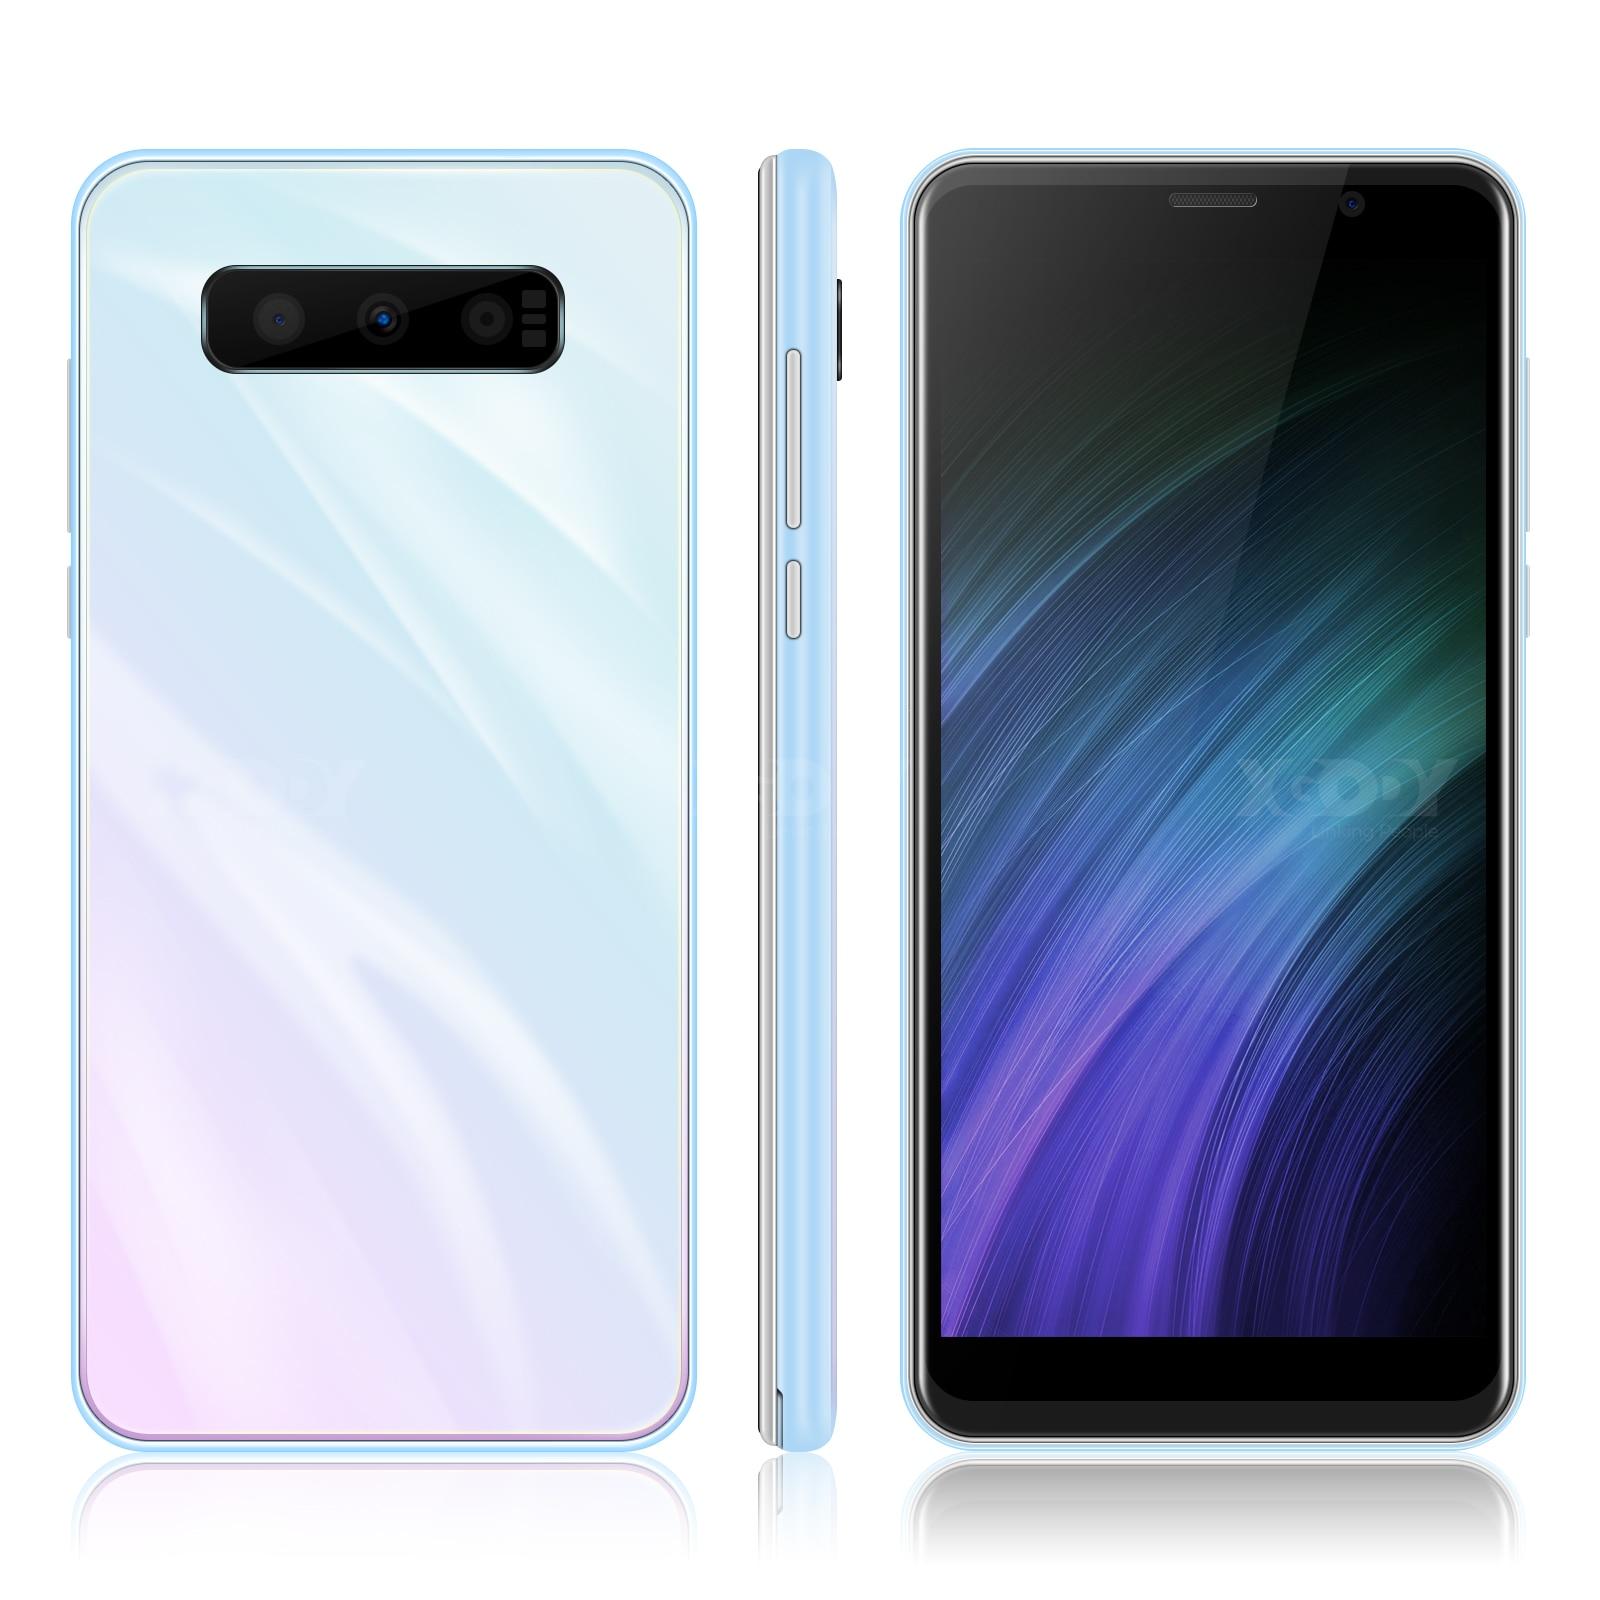 XGODY 3G Smartphone 2GB RAM 16GB ROM  5.5'' 18:9 Full Screen  MT6580 Quad Core Mobile Phone Dual Sim 5MP 2500mAh S10 Cellphone